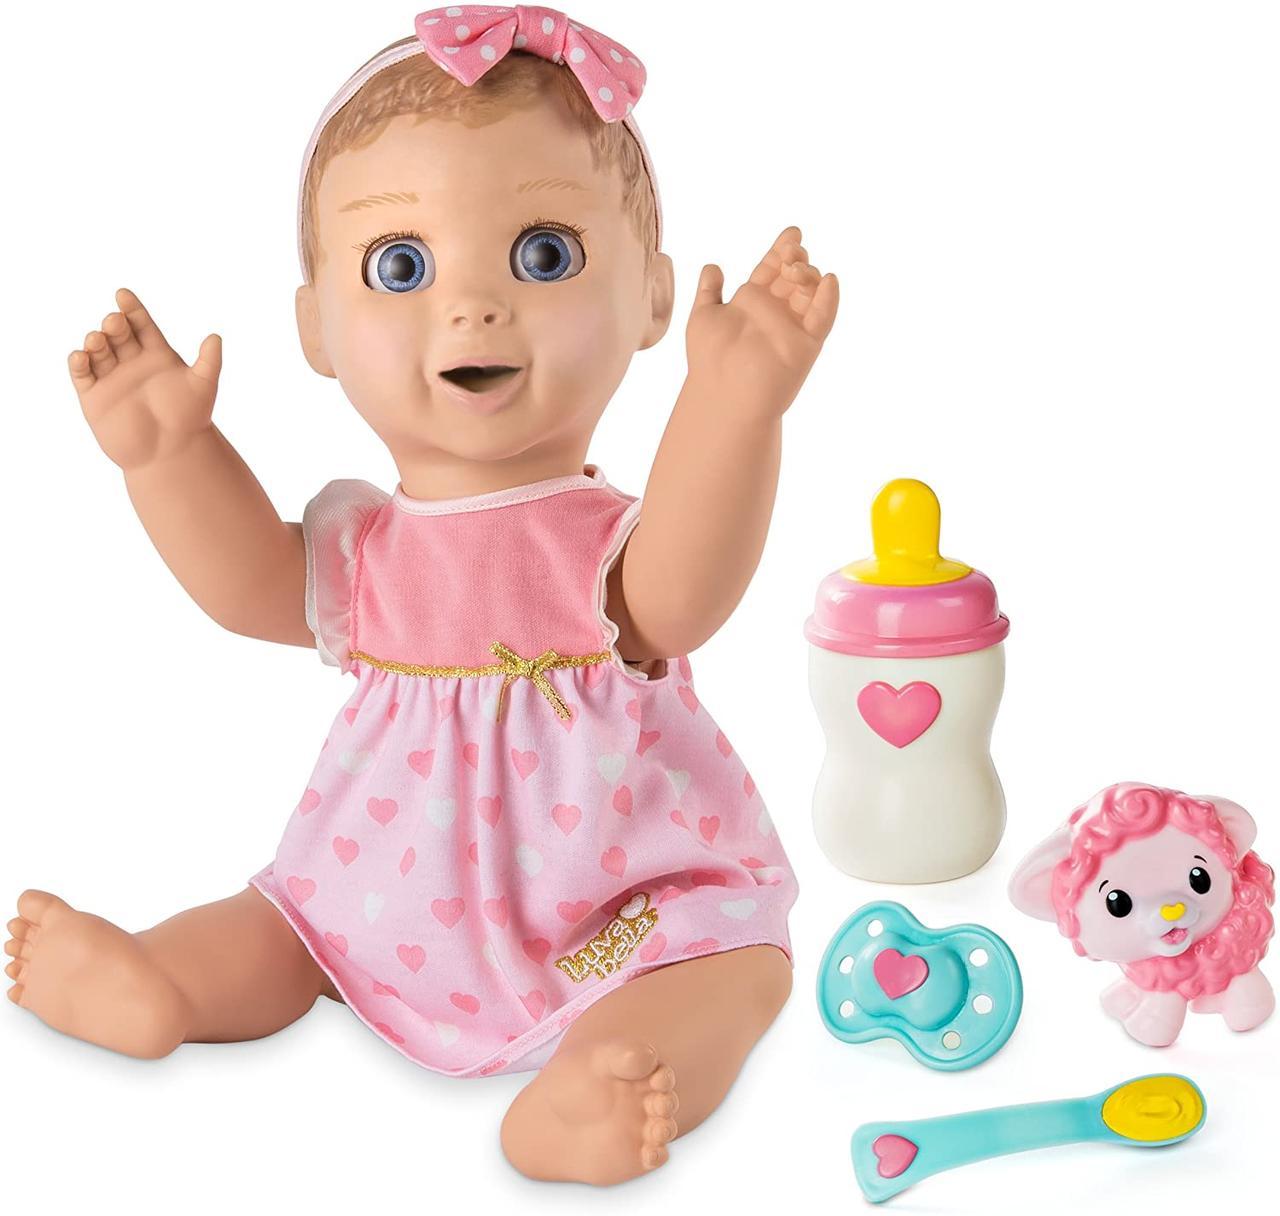 Інтерактивна лялька Лувабелла Блондинка Luvabella Blonde